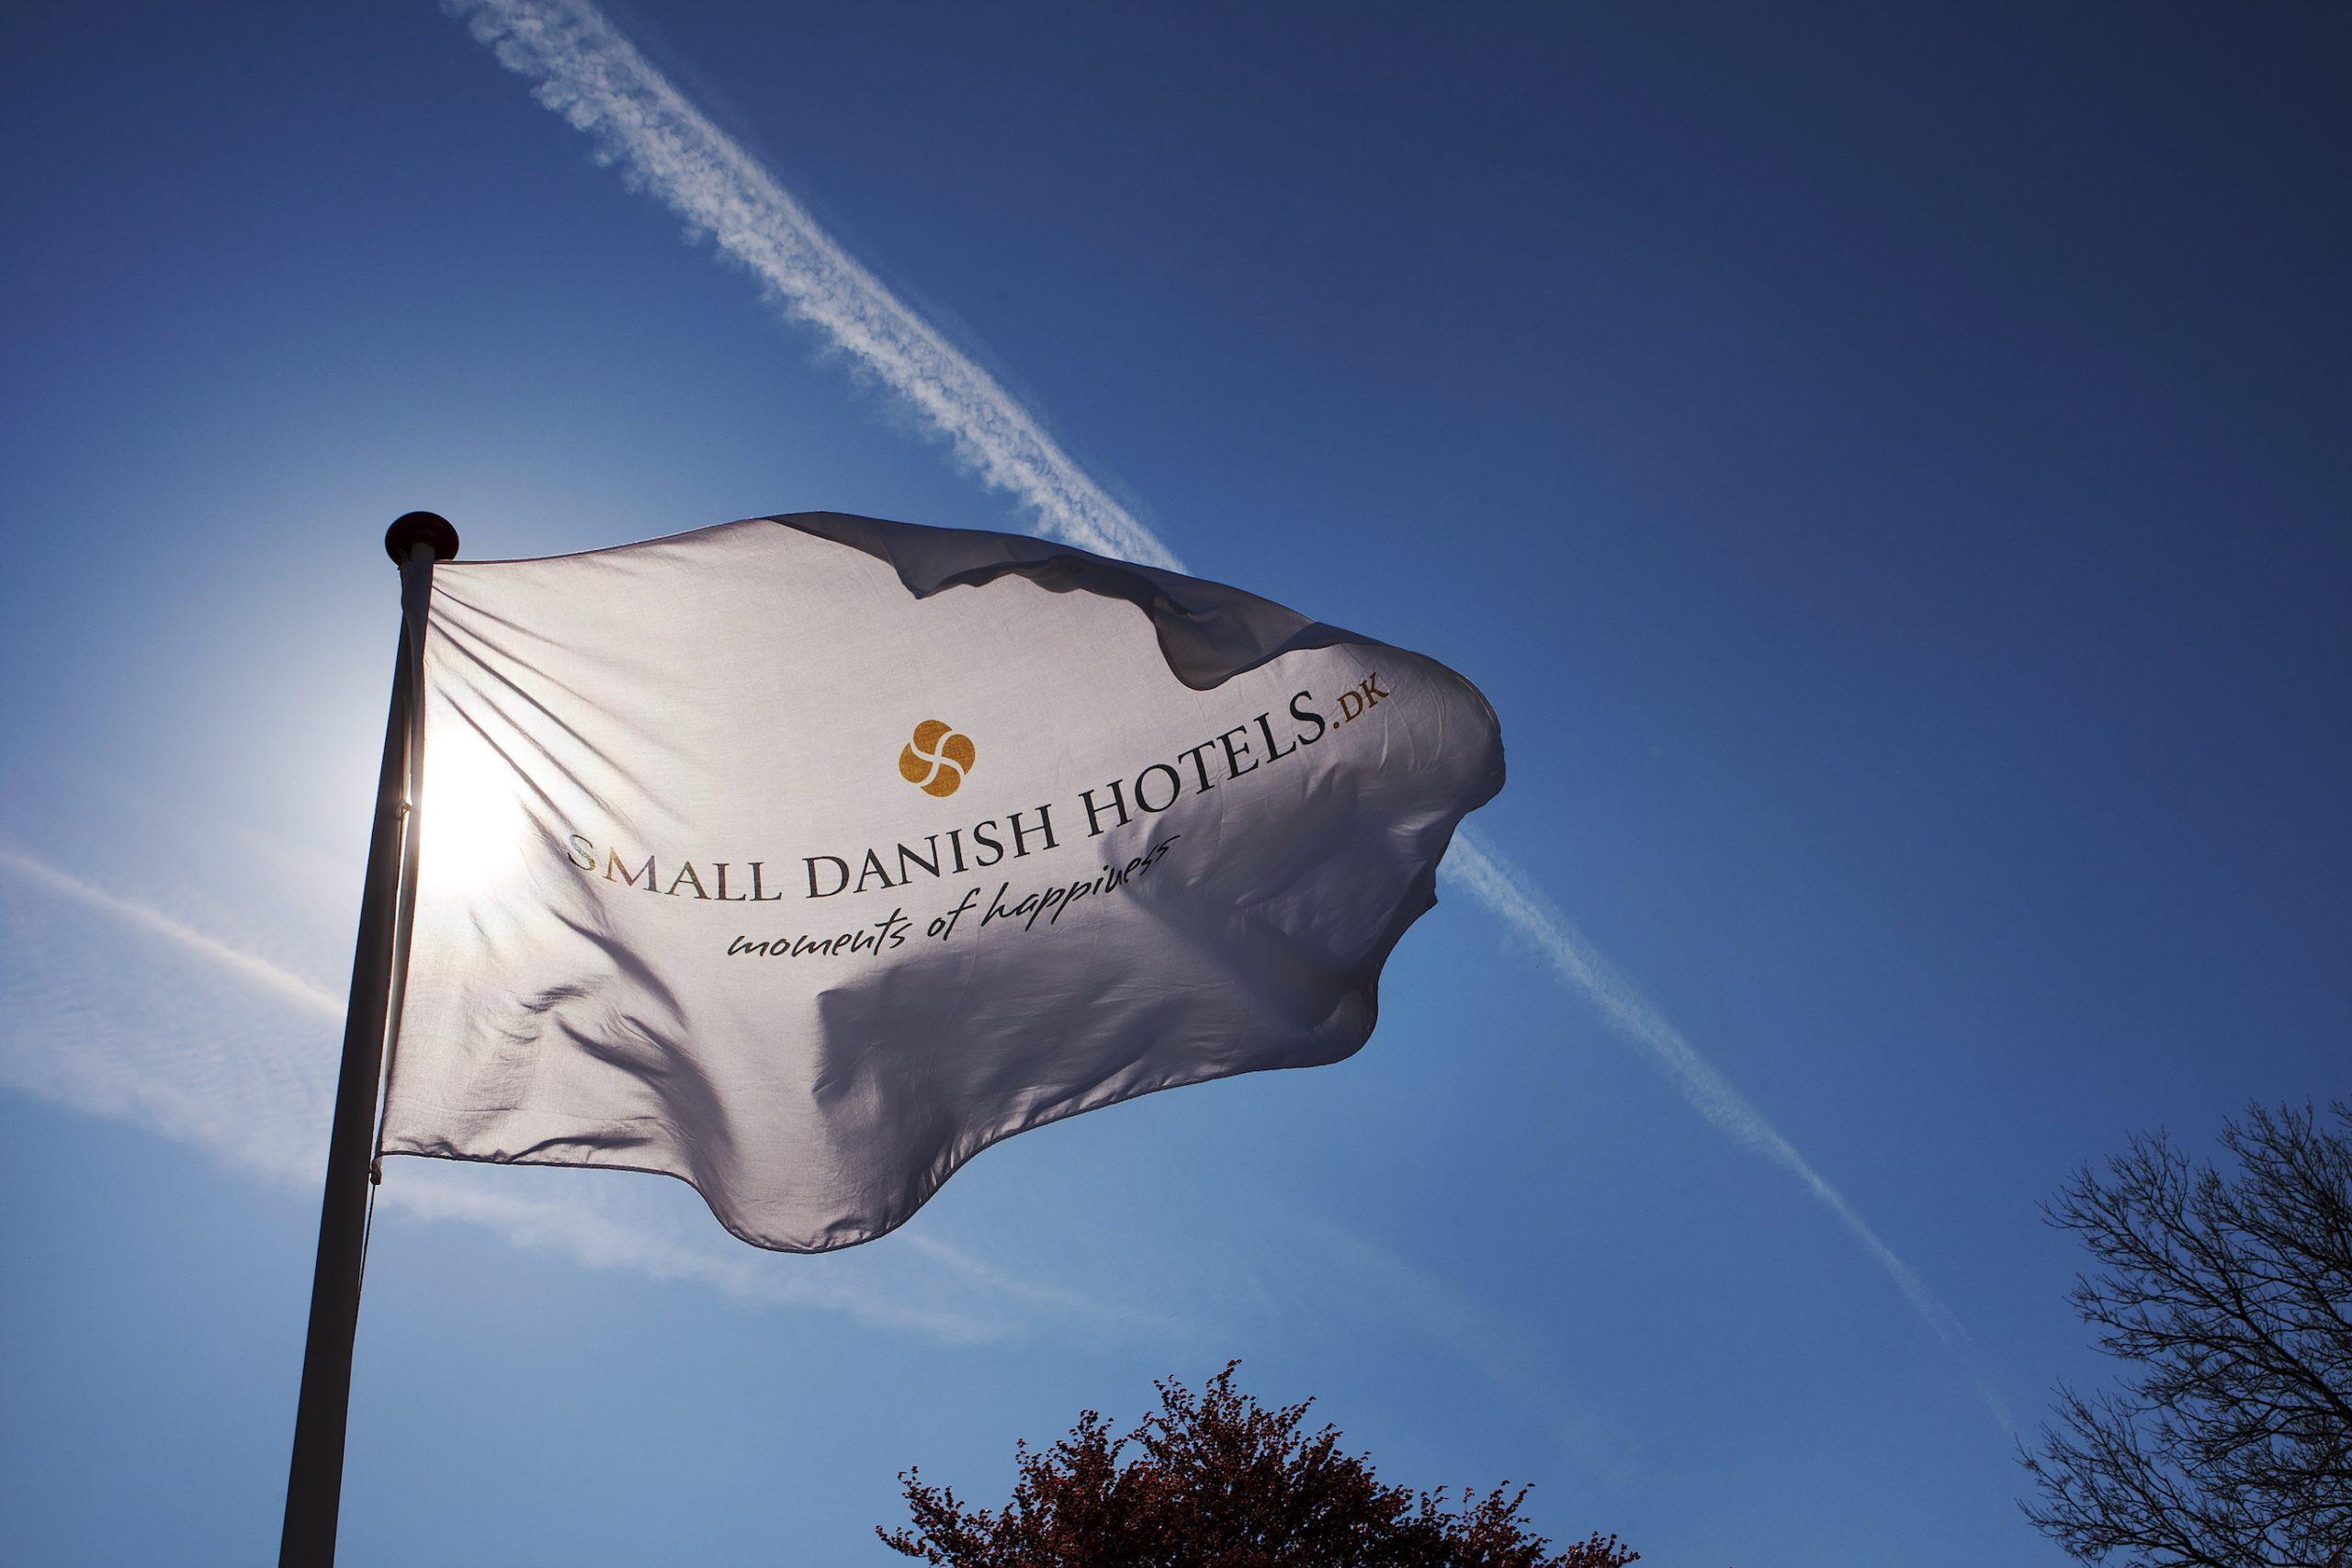 Small Danish Hotels har netop nu 63 medlemmer blandt kroer, hoteller, herrehårde, slotte og så videre. PR-foto: Claus Haagensen.